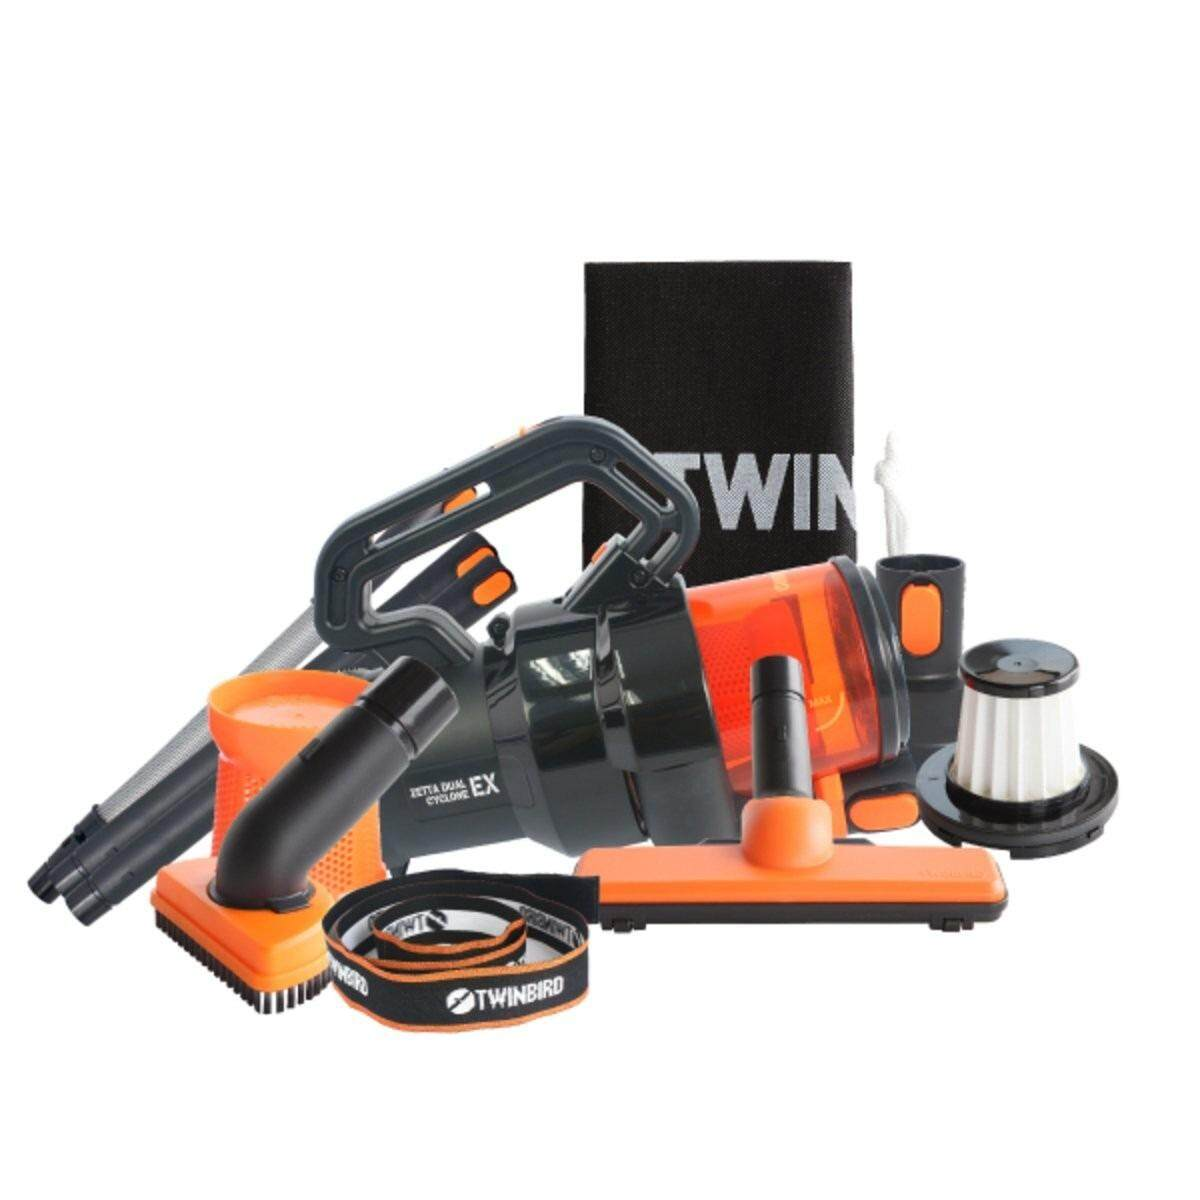 Twinbird Ssenstorm TB-Q251 Power Handy Vacuum Cleaner - A Handheld Dustbuster & Blower (USED)